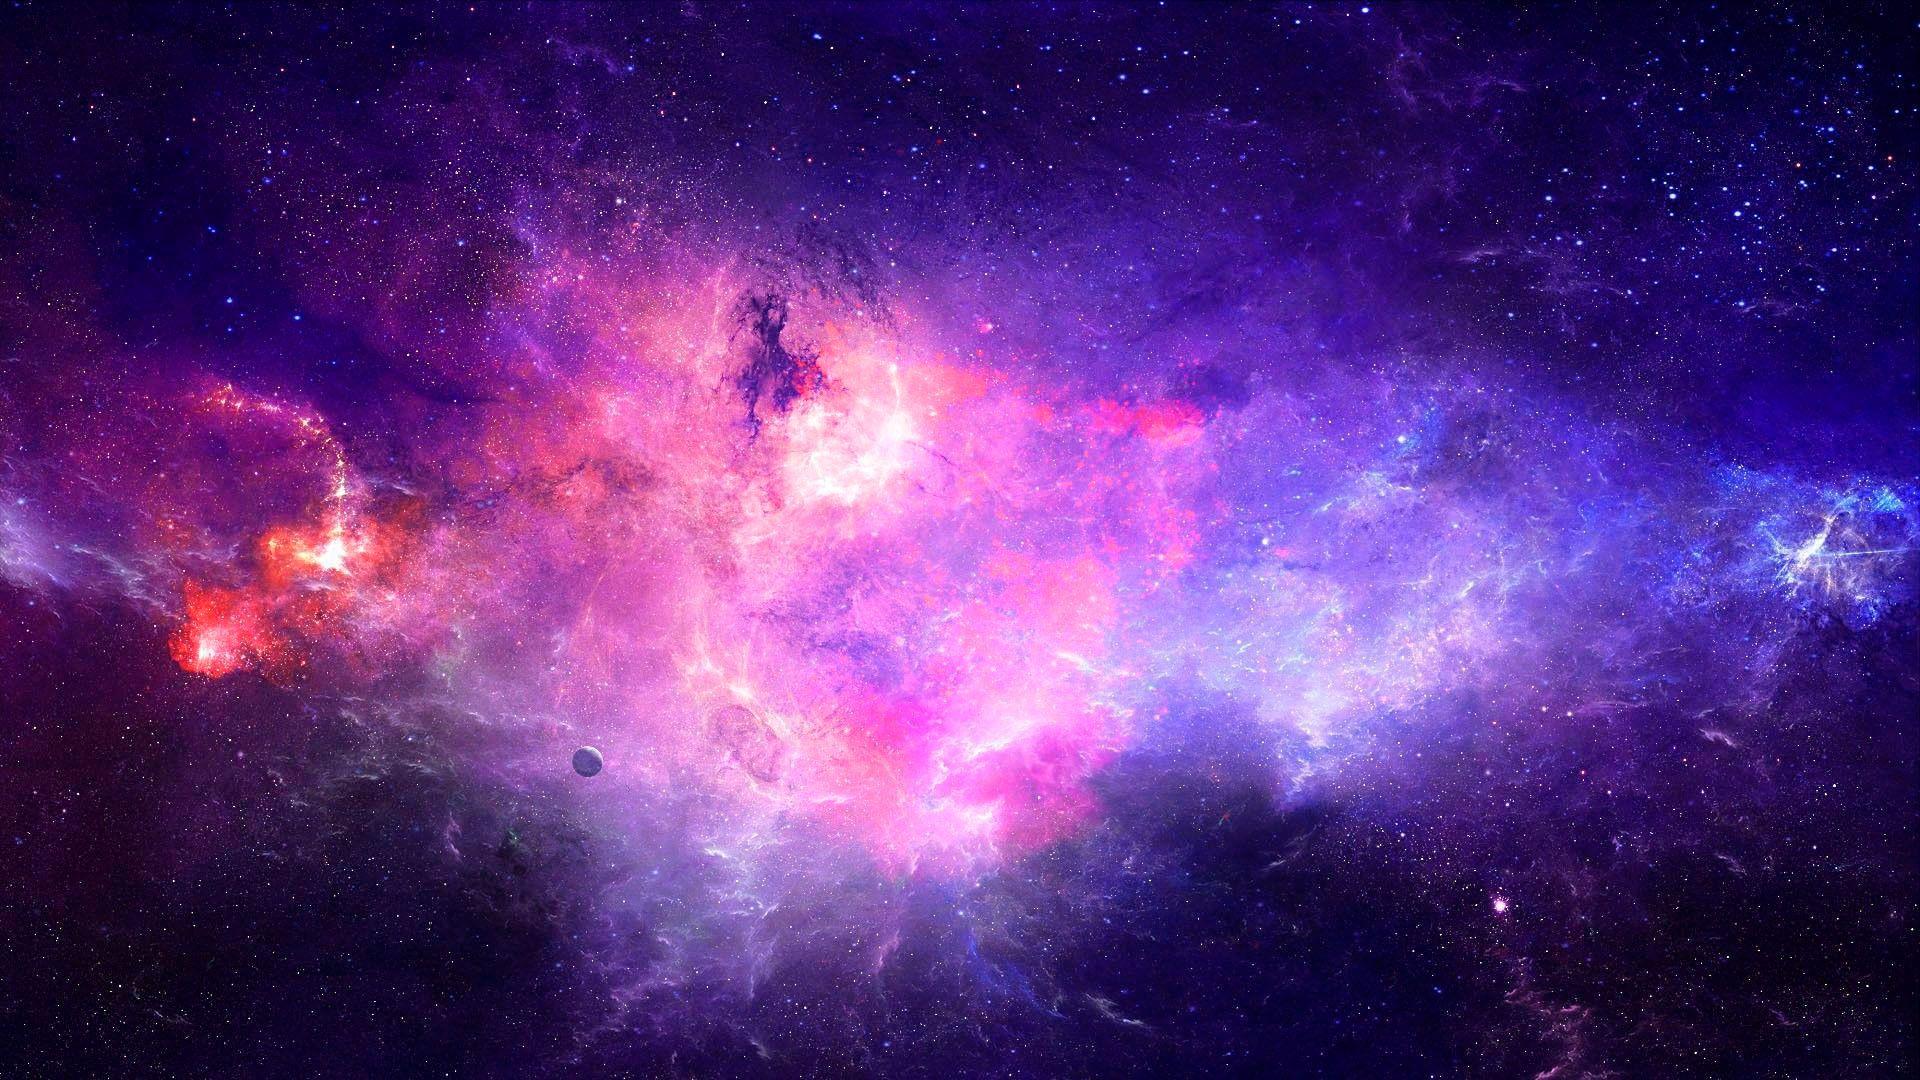 Galaxy 1080p Background 1920x1080 Hd Galaxy Wallpaper Galaxy Wallpaper Wallpaper Notebook